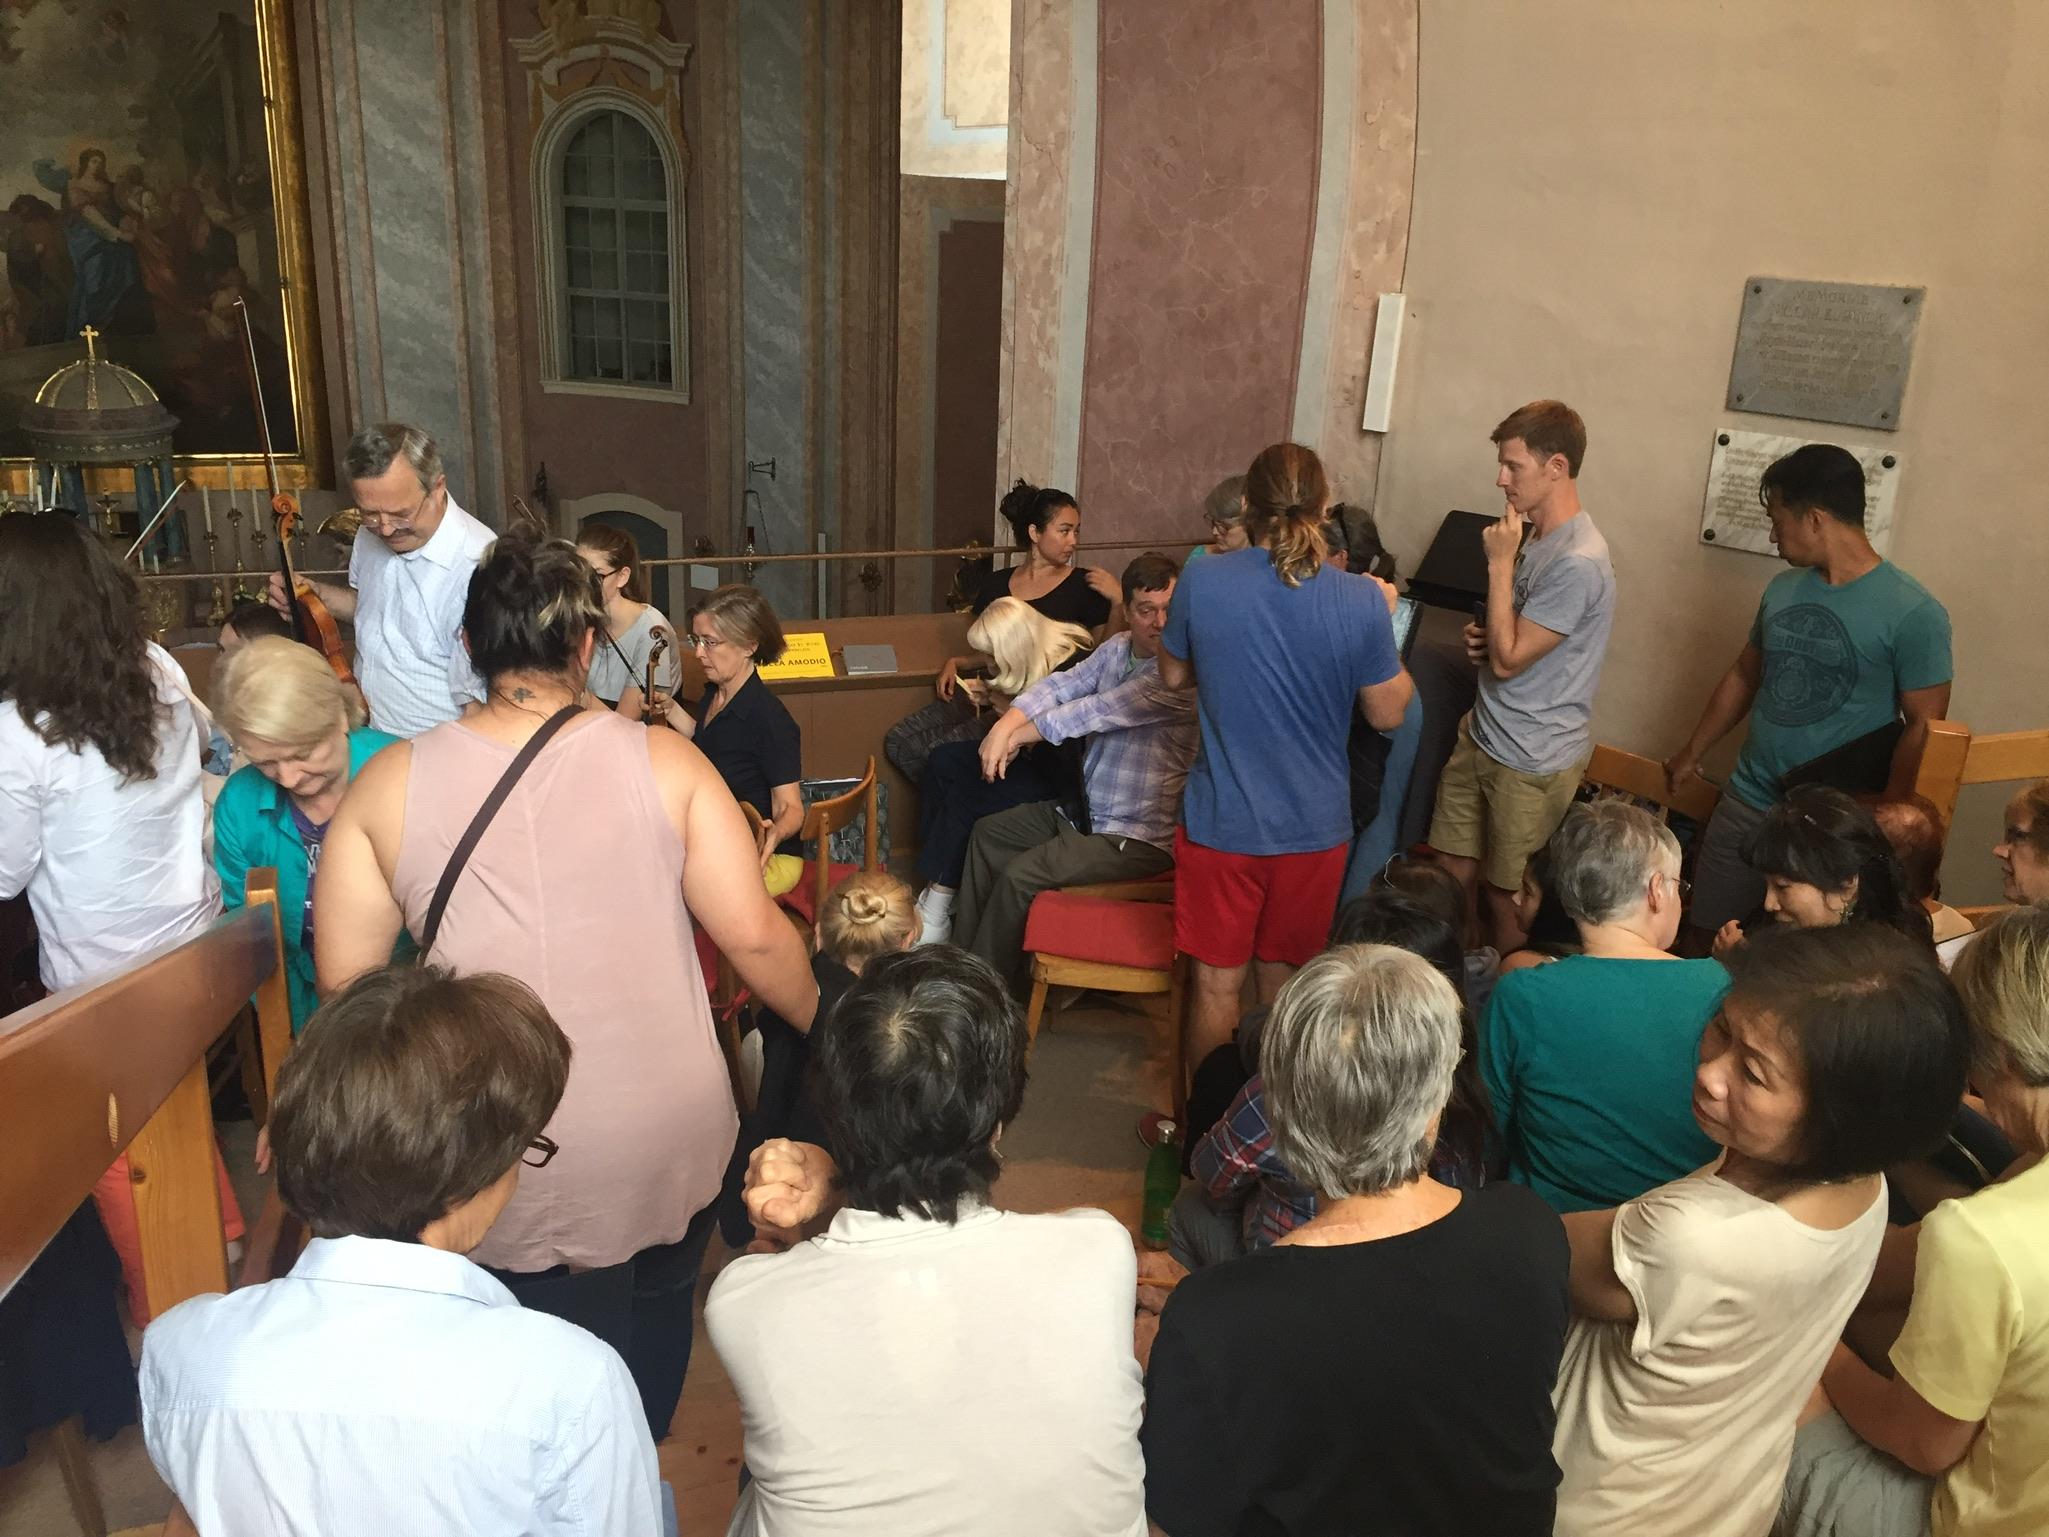 It was a bit crowded in the church's choir loft!